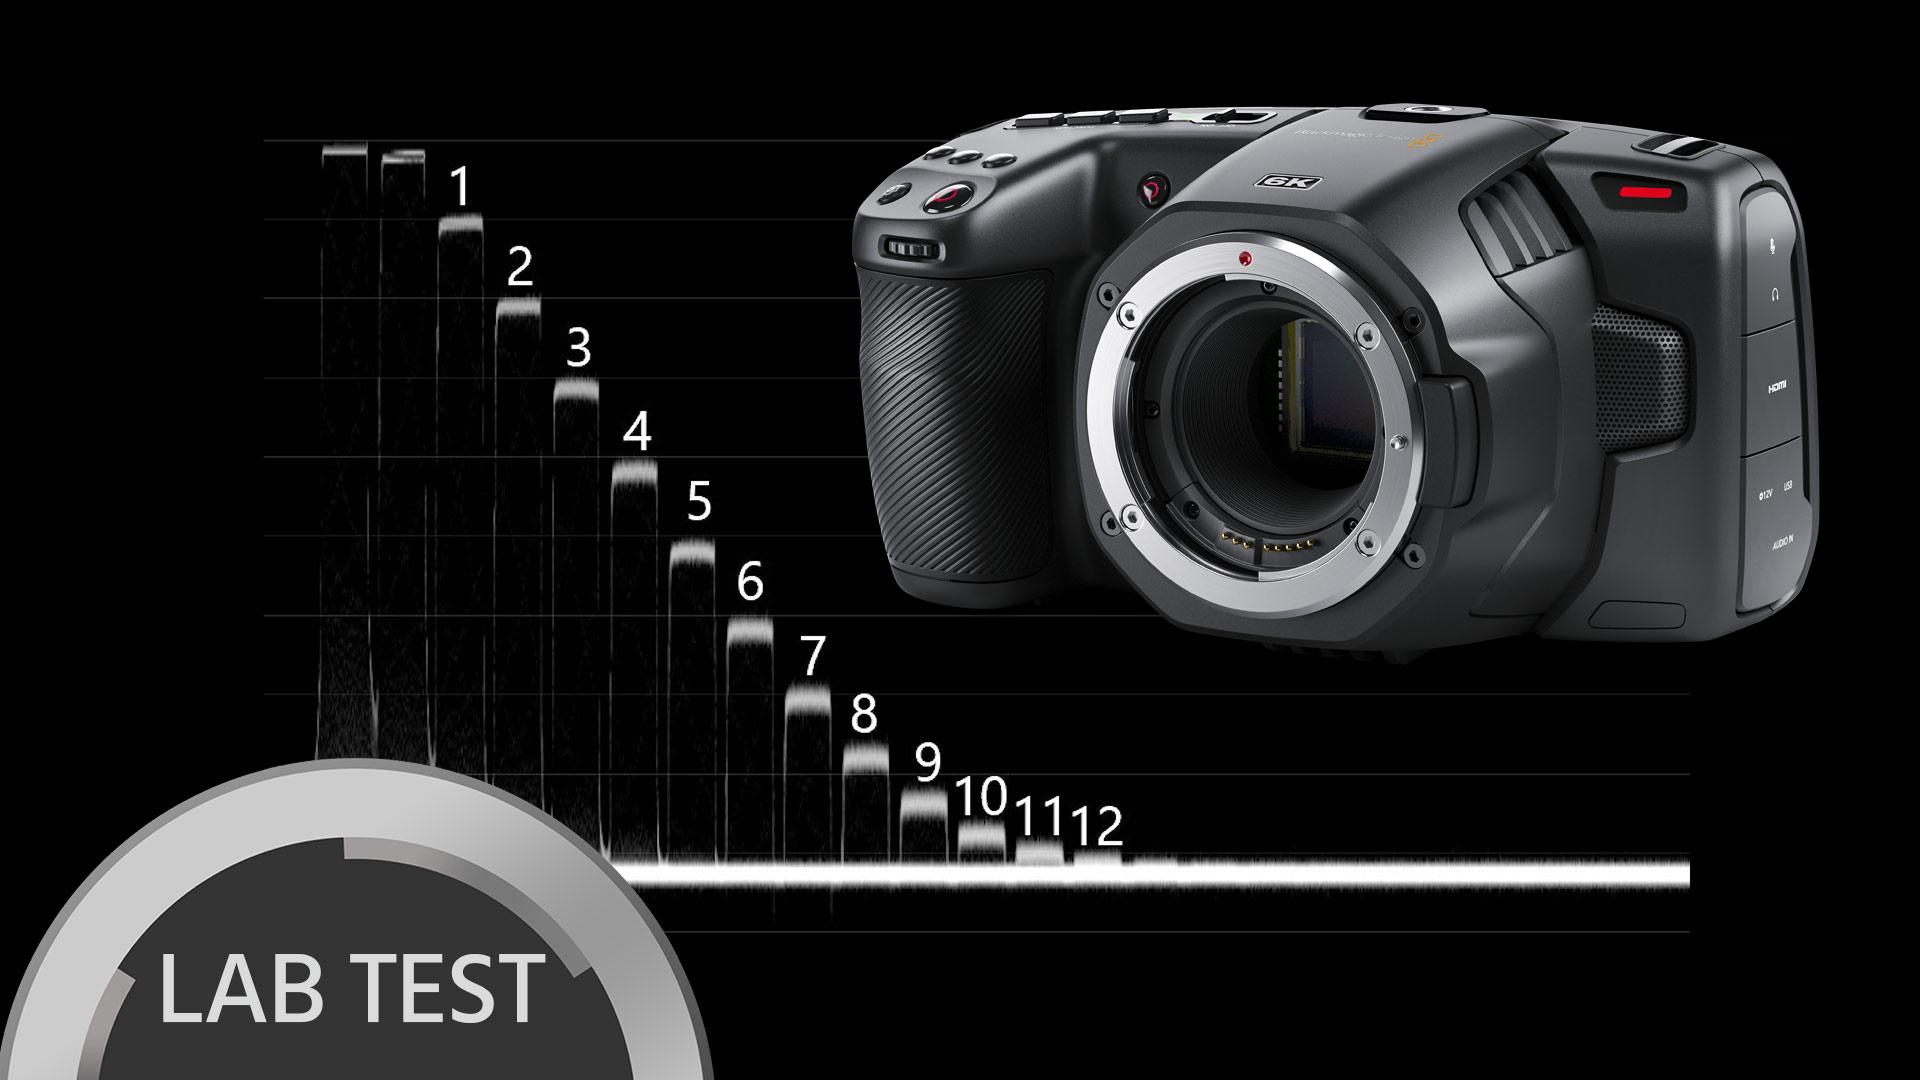 Prueba De Laboratorio De La Blackmagic Pocket Cinema Camera